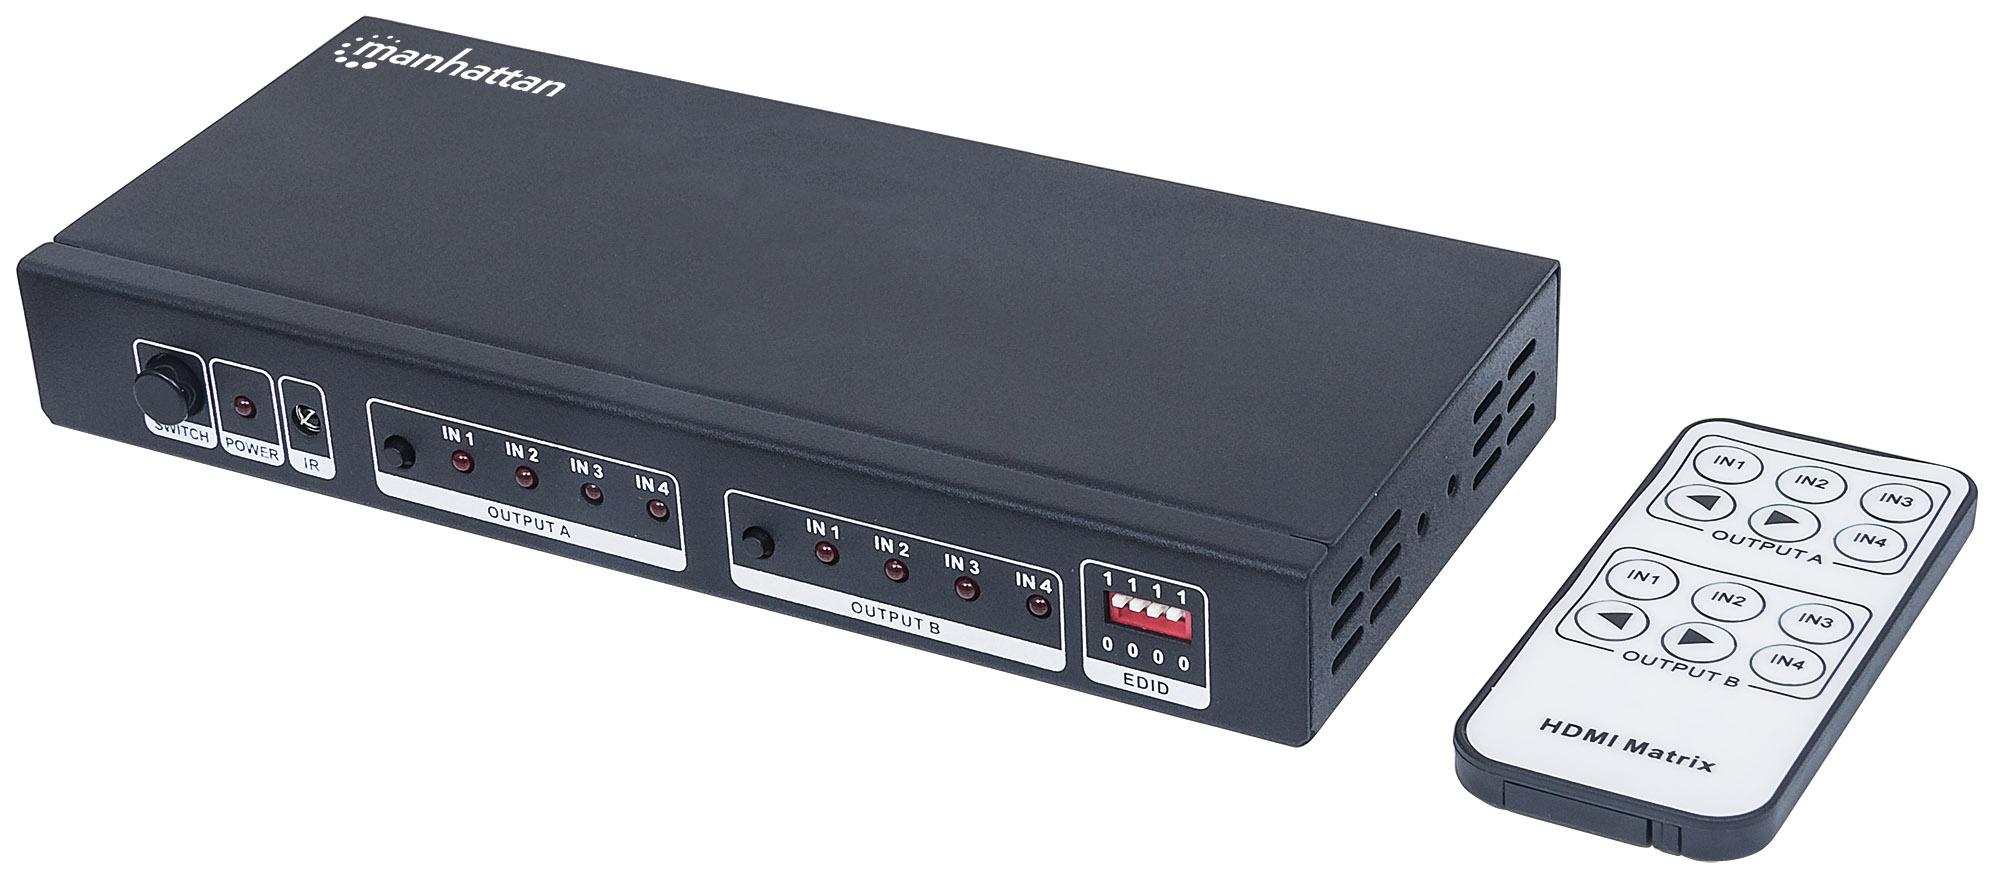 4K 4x2 HDMI Matrix